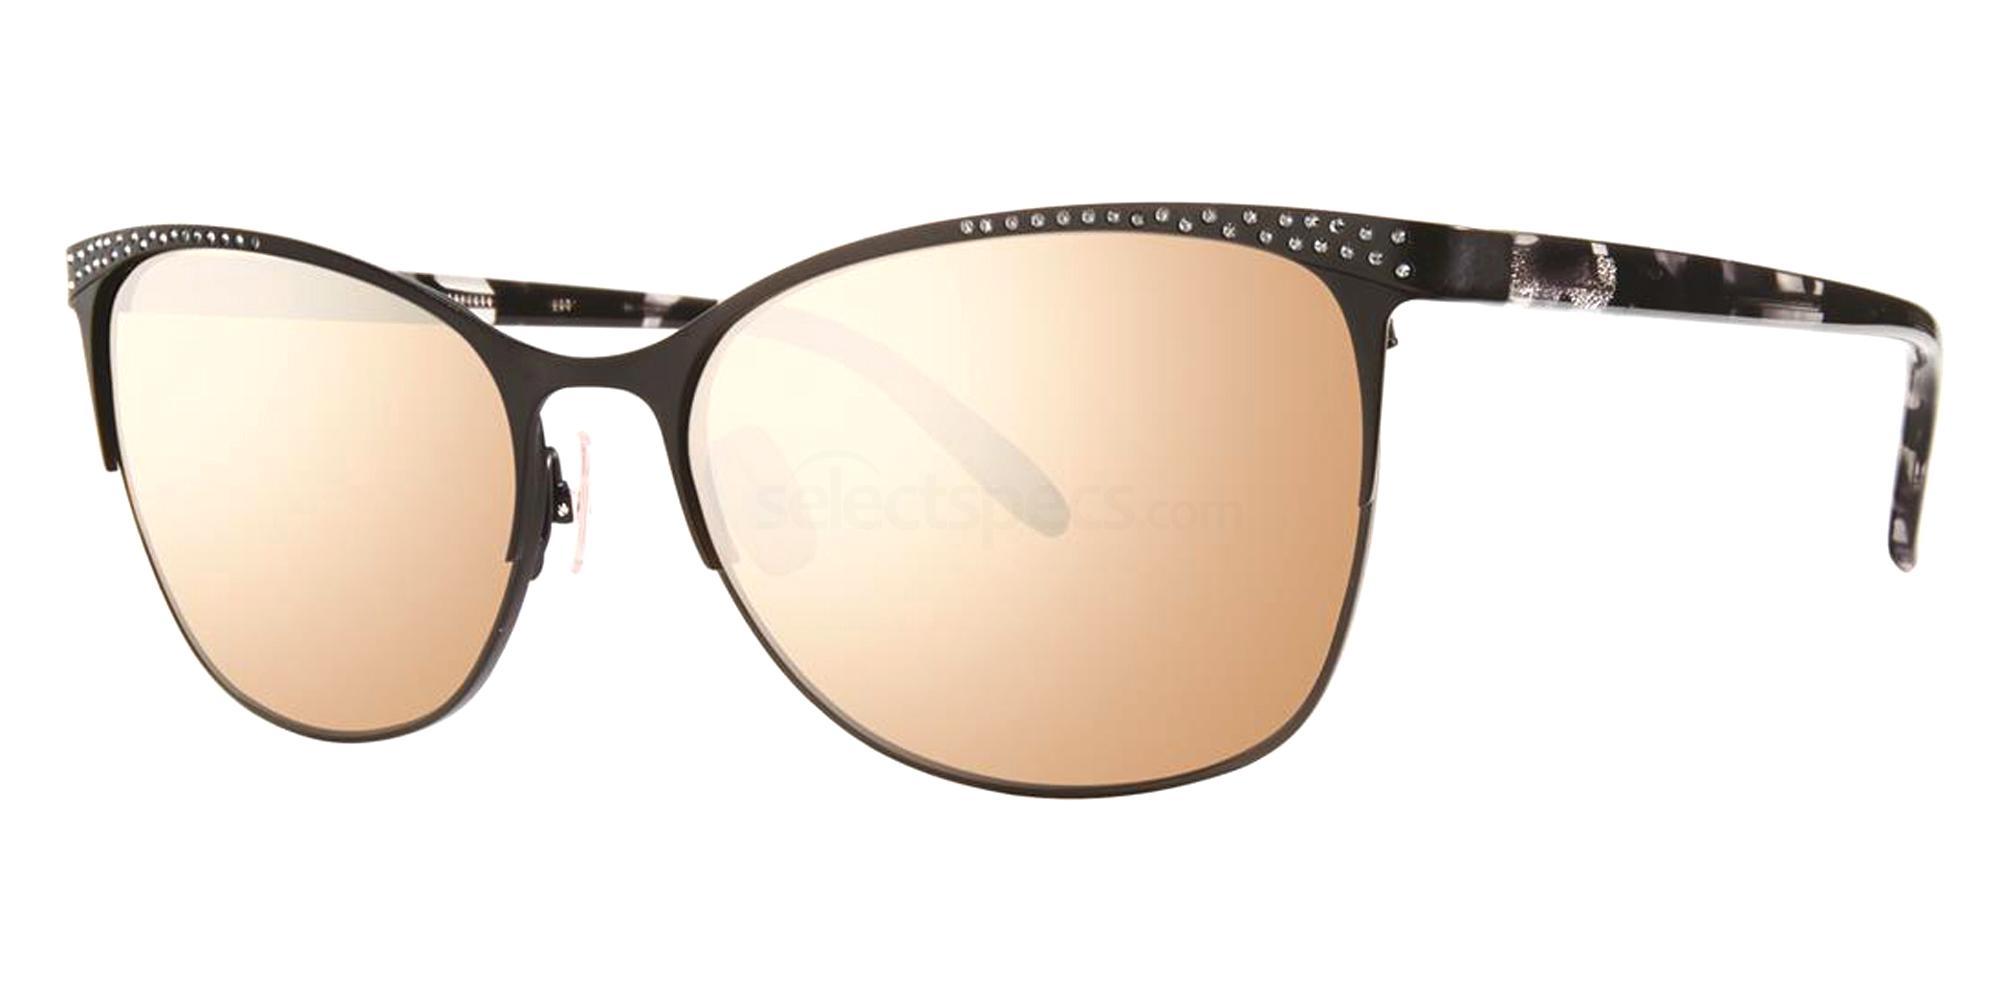 Black JANA Sunglasses, Vera Wang Luxe